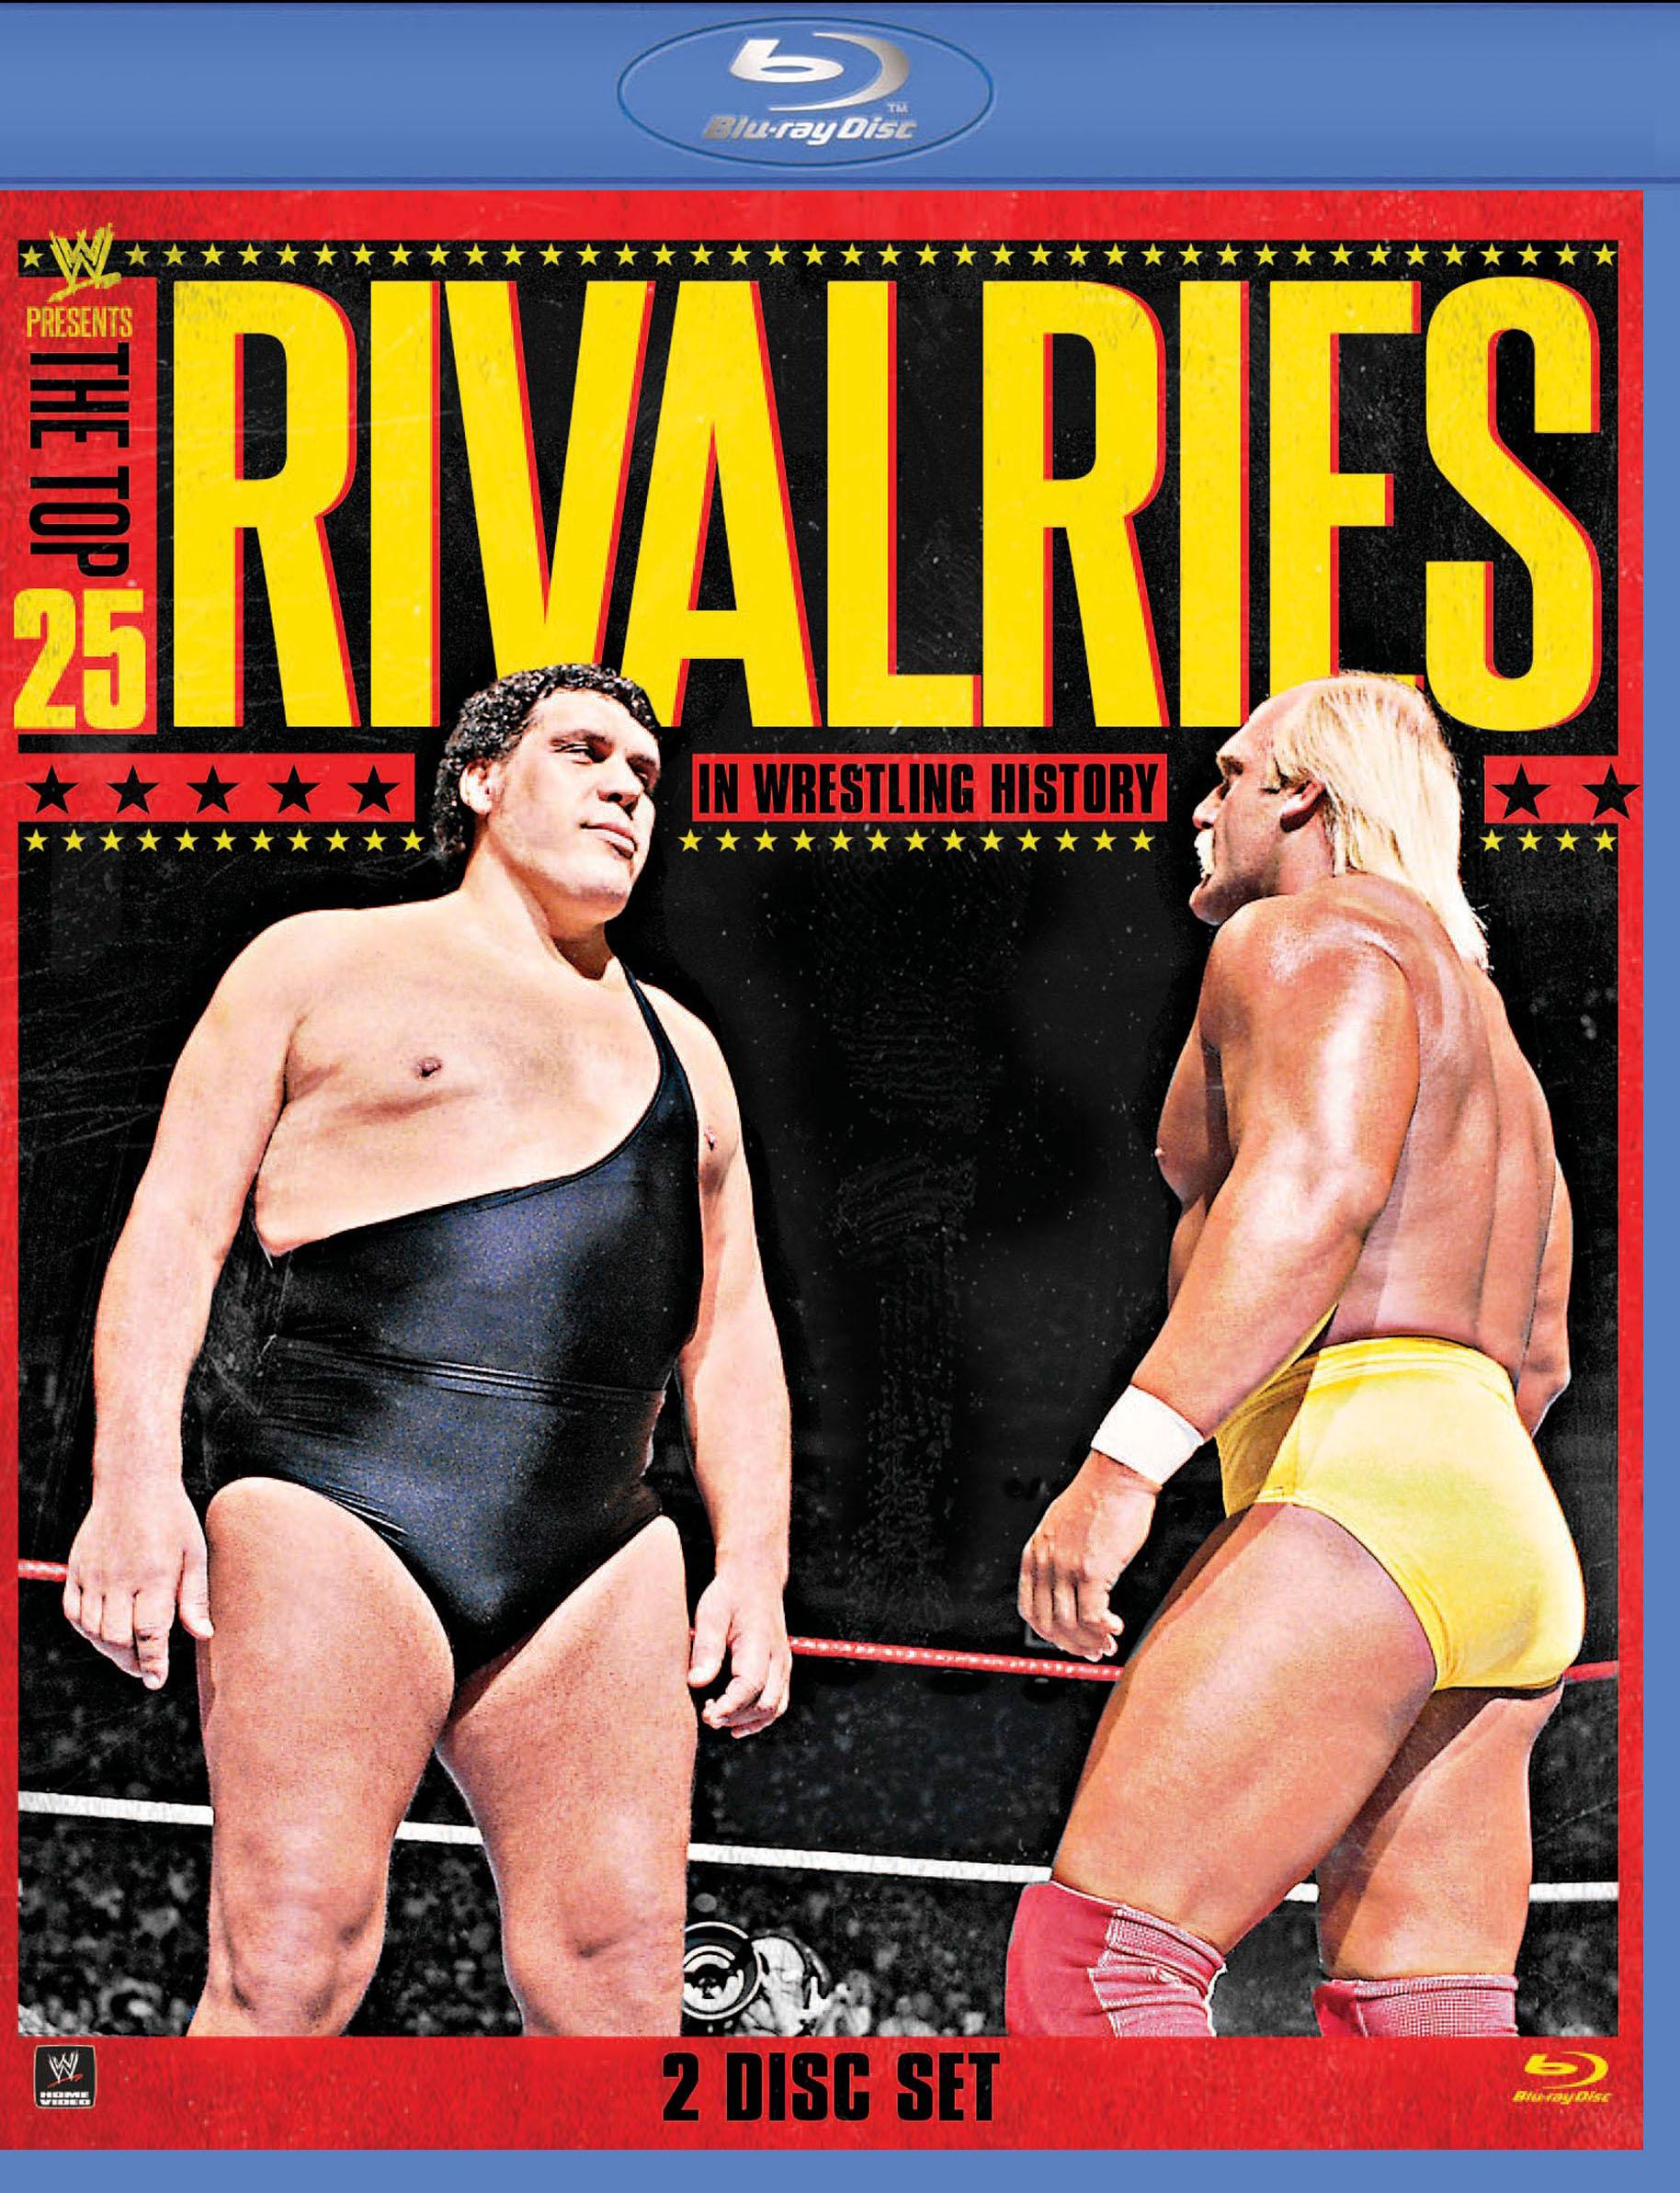 WWE: Top 25 Rivalries